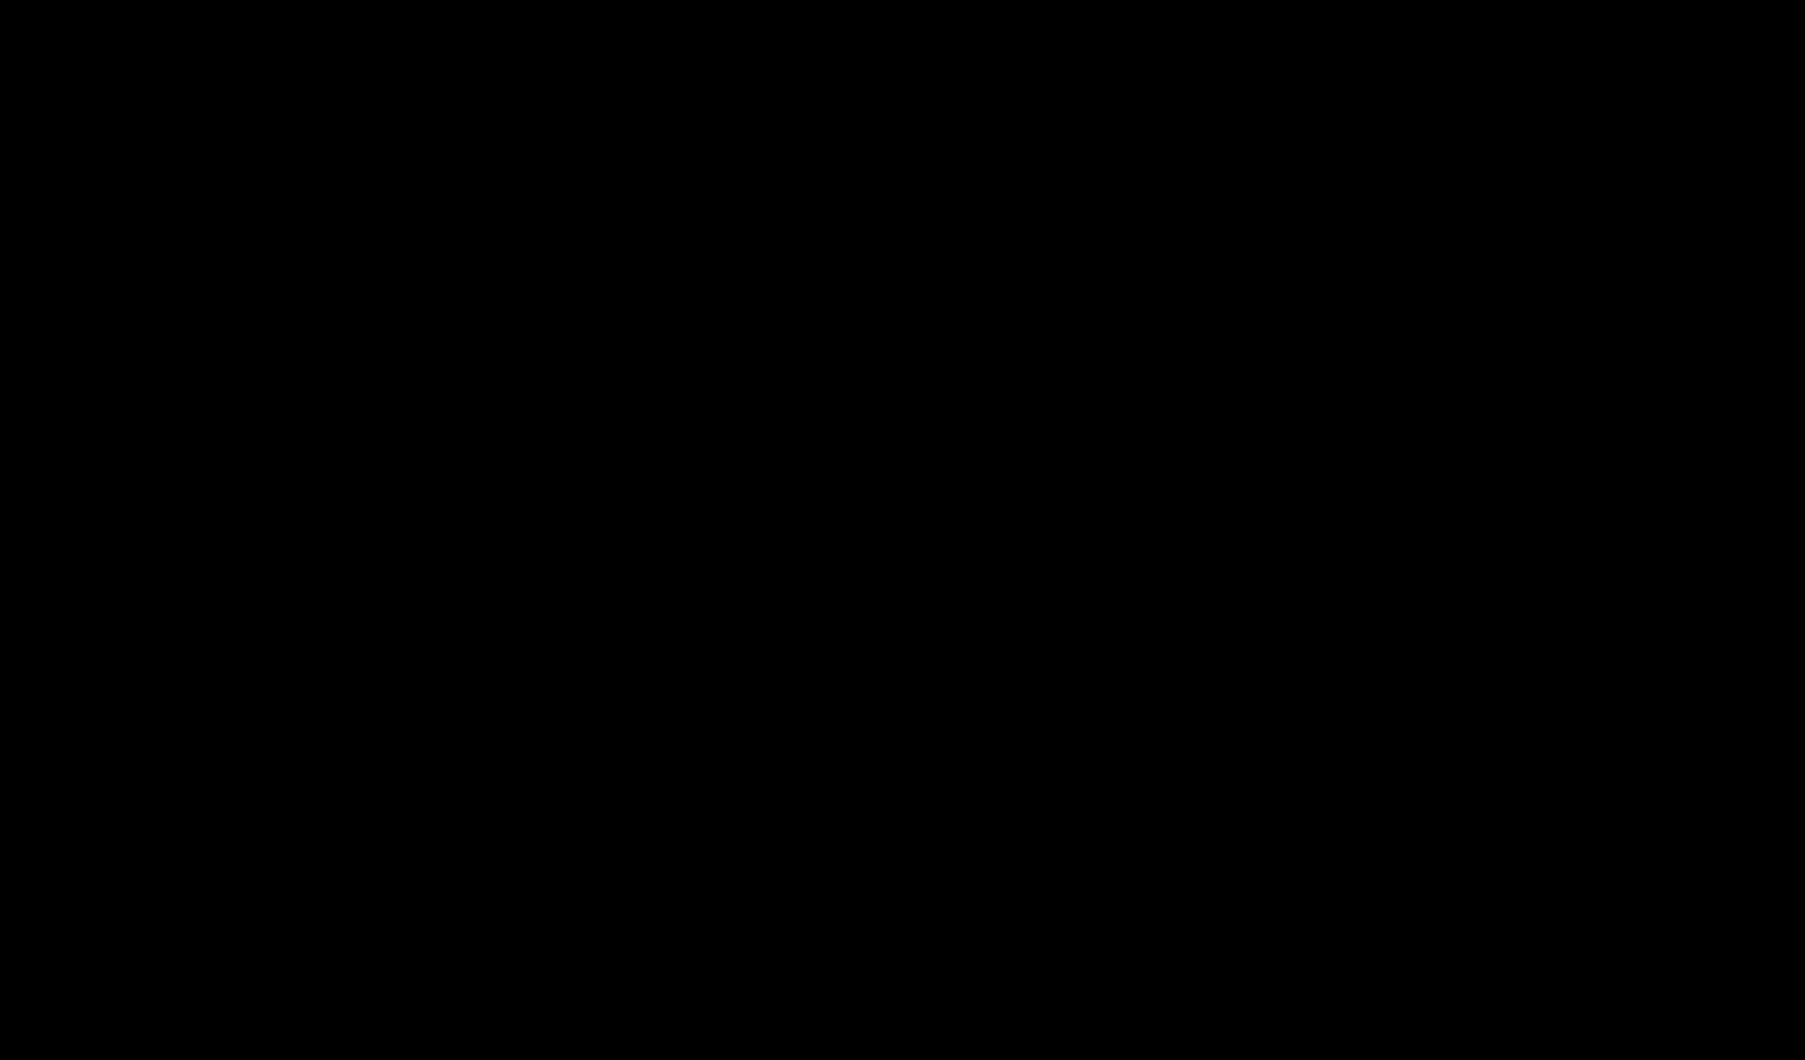 Ciprofloxacin - 13C4